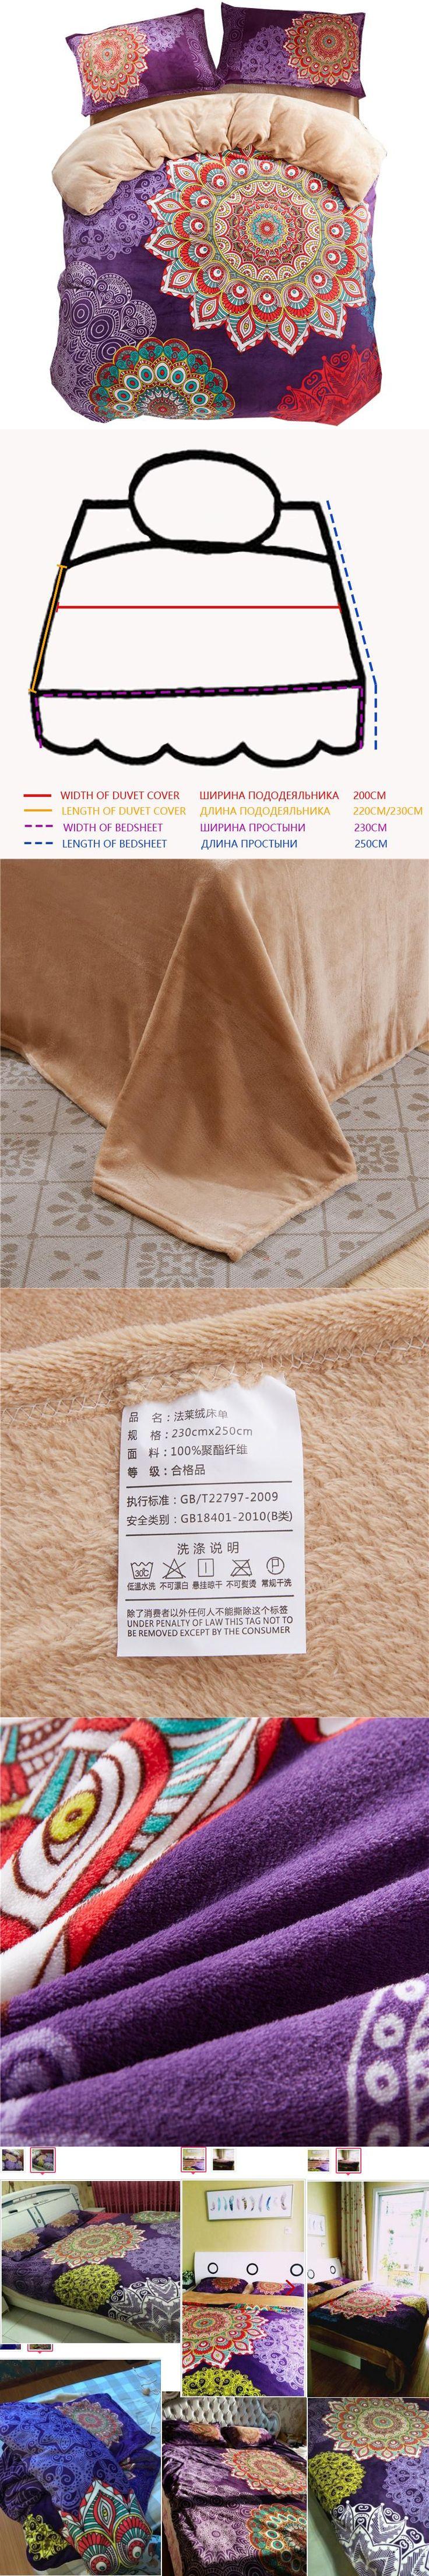 Svetanya Smooth Soft Bedlinen Flannel Fleece Fabric Queen Double bed size Winter warm Bedding Sets Bohemian Style